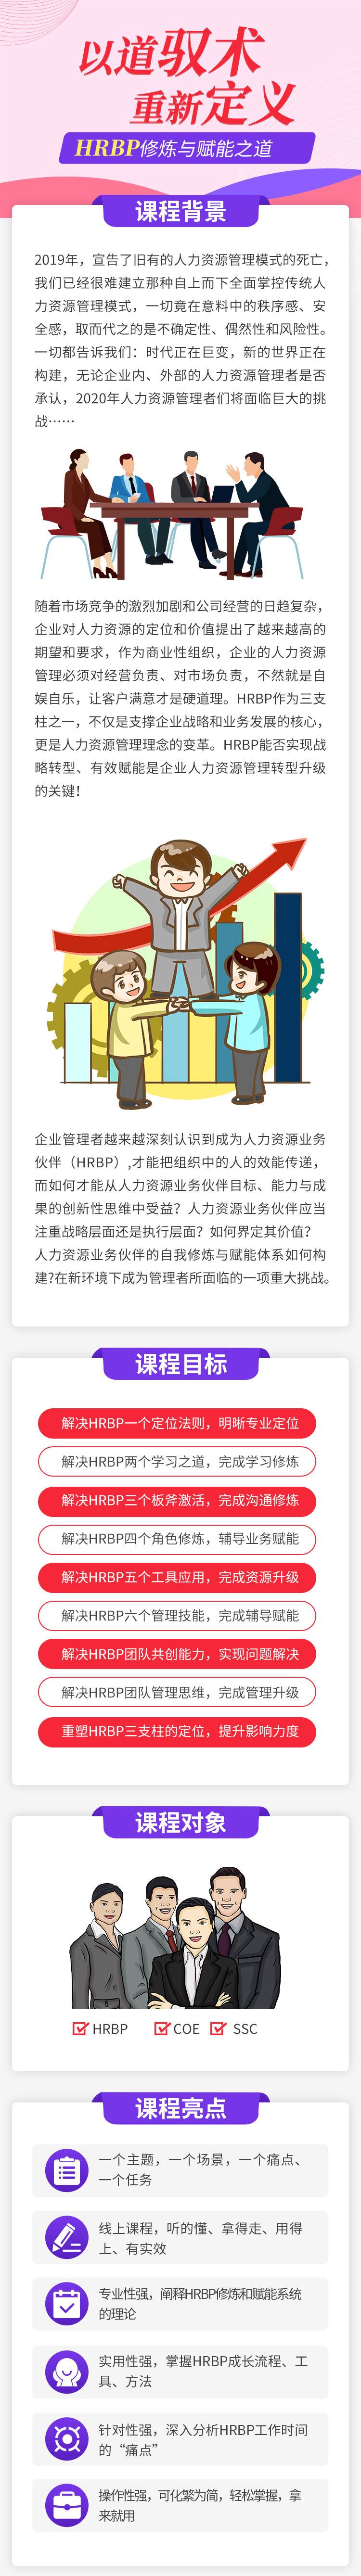 https://hs-1251609649.cos.ap-guangzhou.myqcloud.com/newhdp%2Flive_cover%2F4667%2F5f8d1a5ff0509939644c405431206af6.jpeg